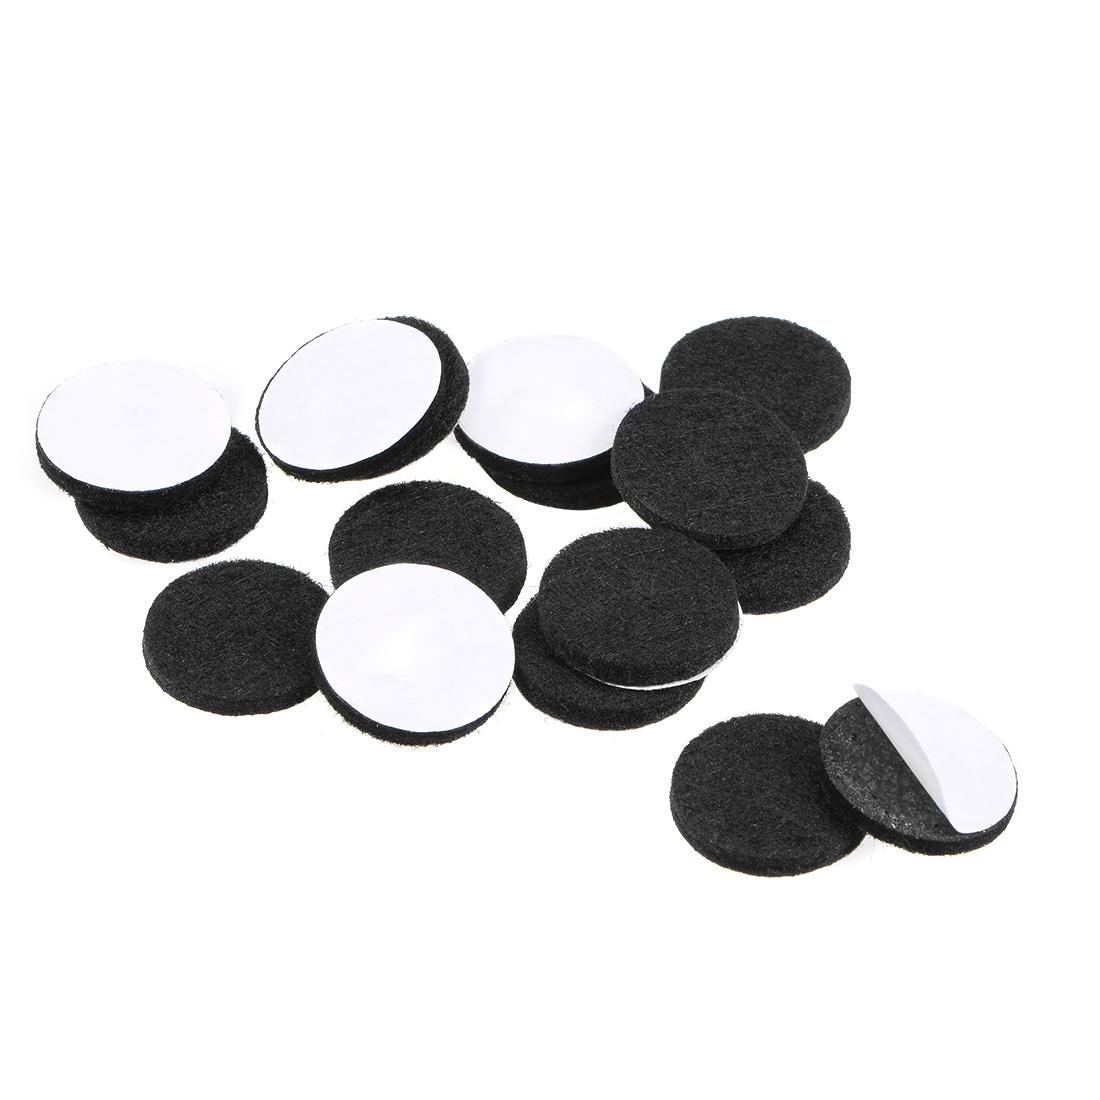 Furniture Pads Adhesive Felt Pads 20mm Diameter 3mm Thick Round Black 28Pcs